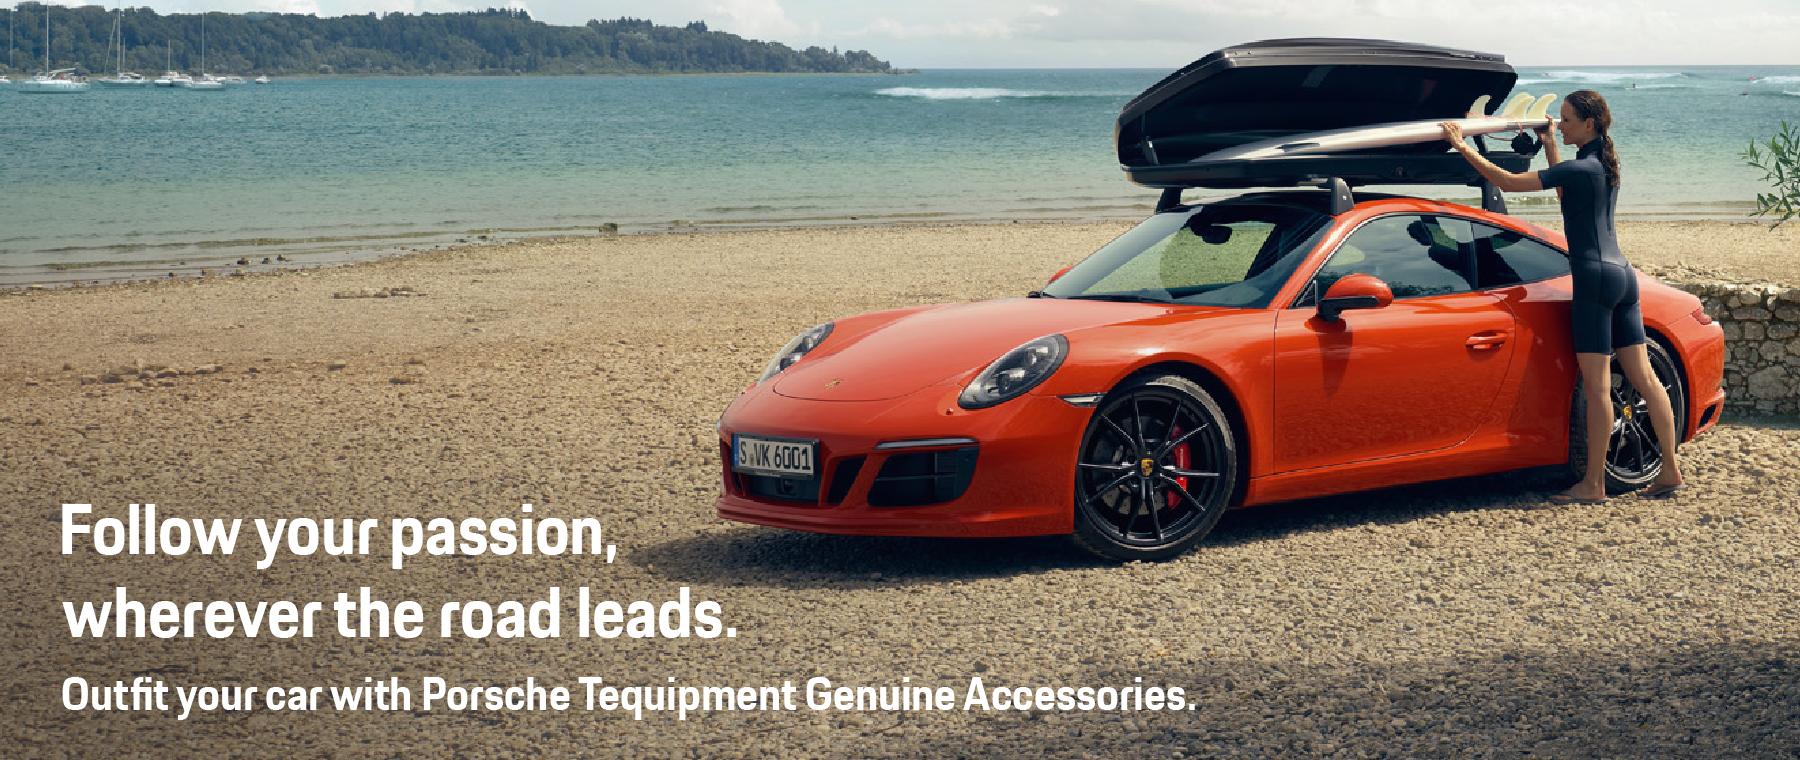 Porsche Tequipment Genuine Accessories – DI